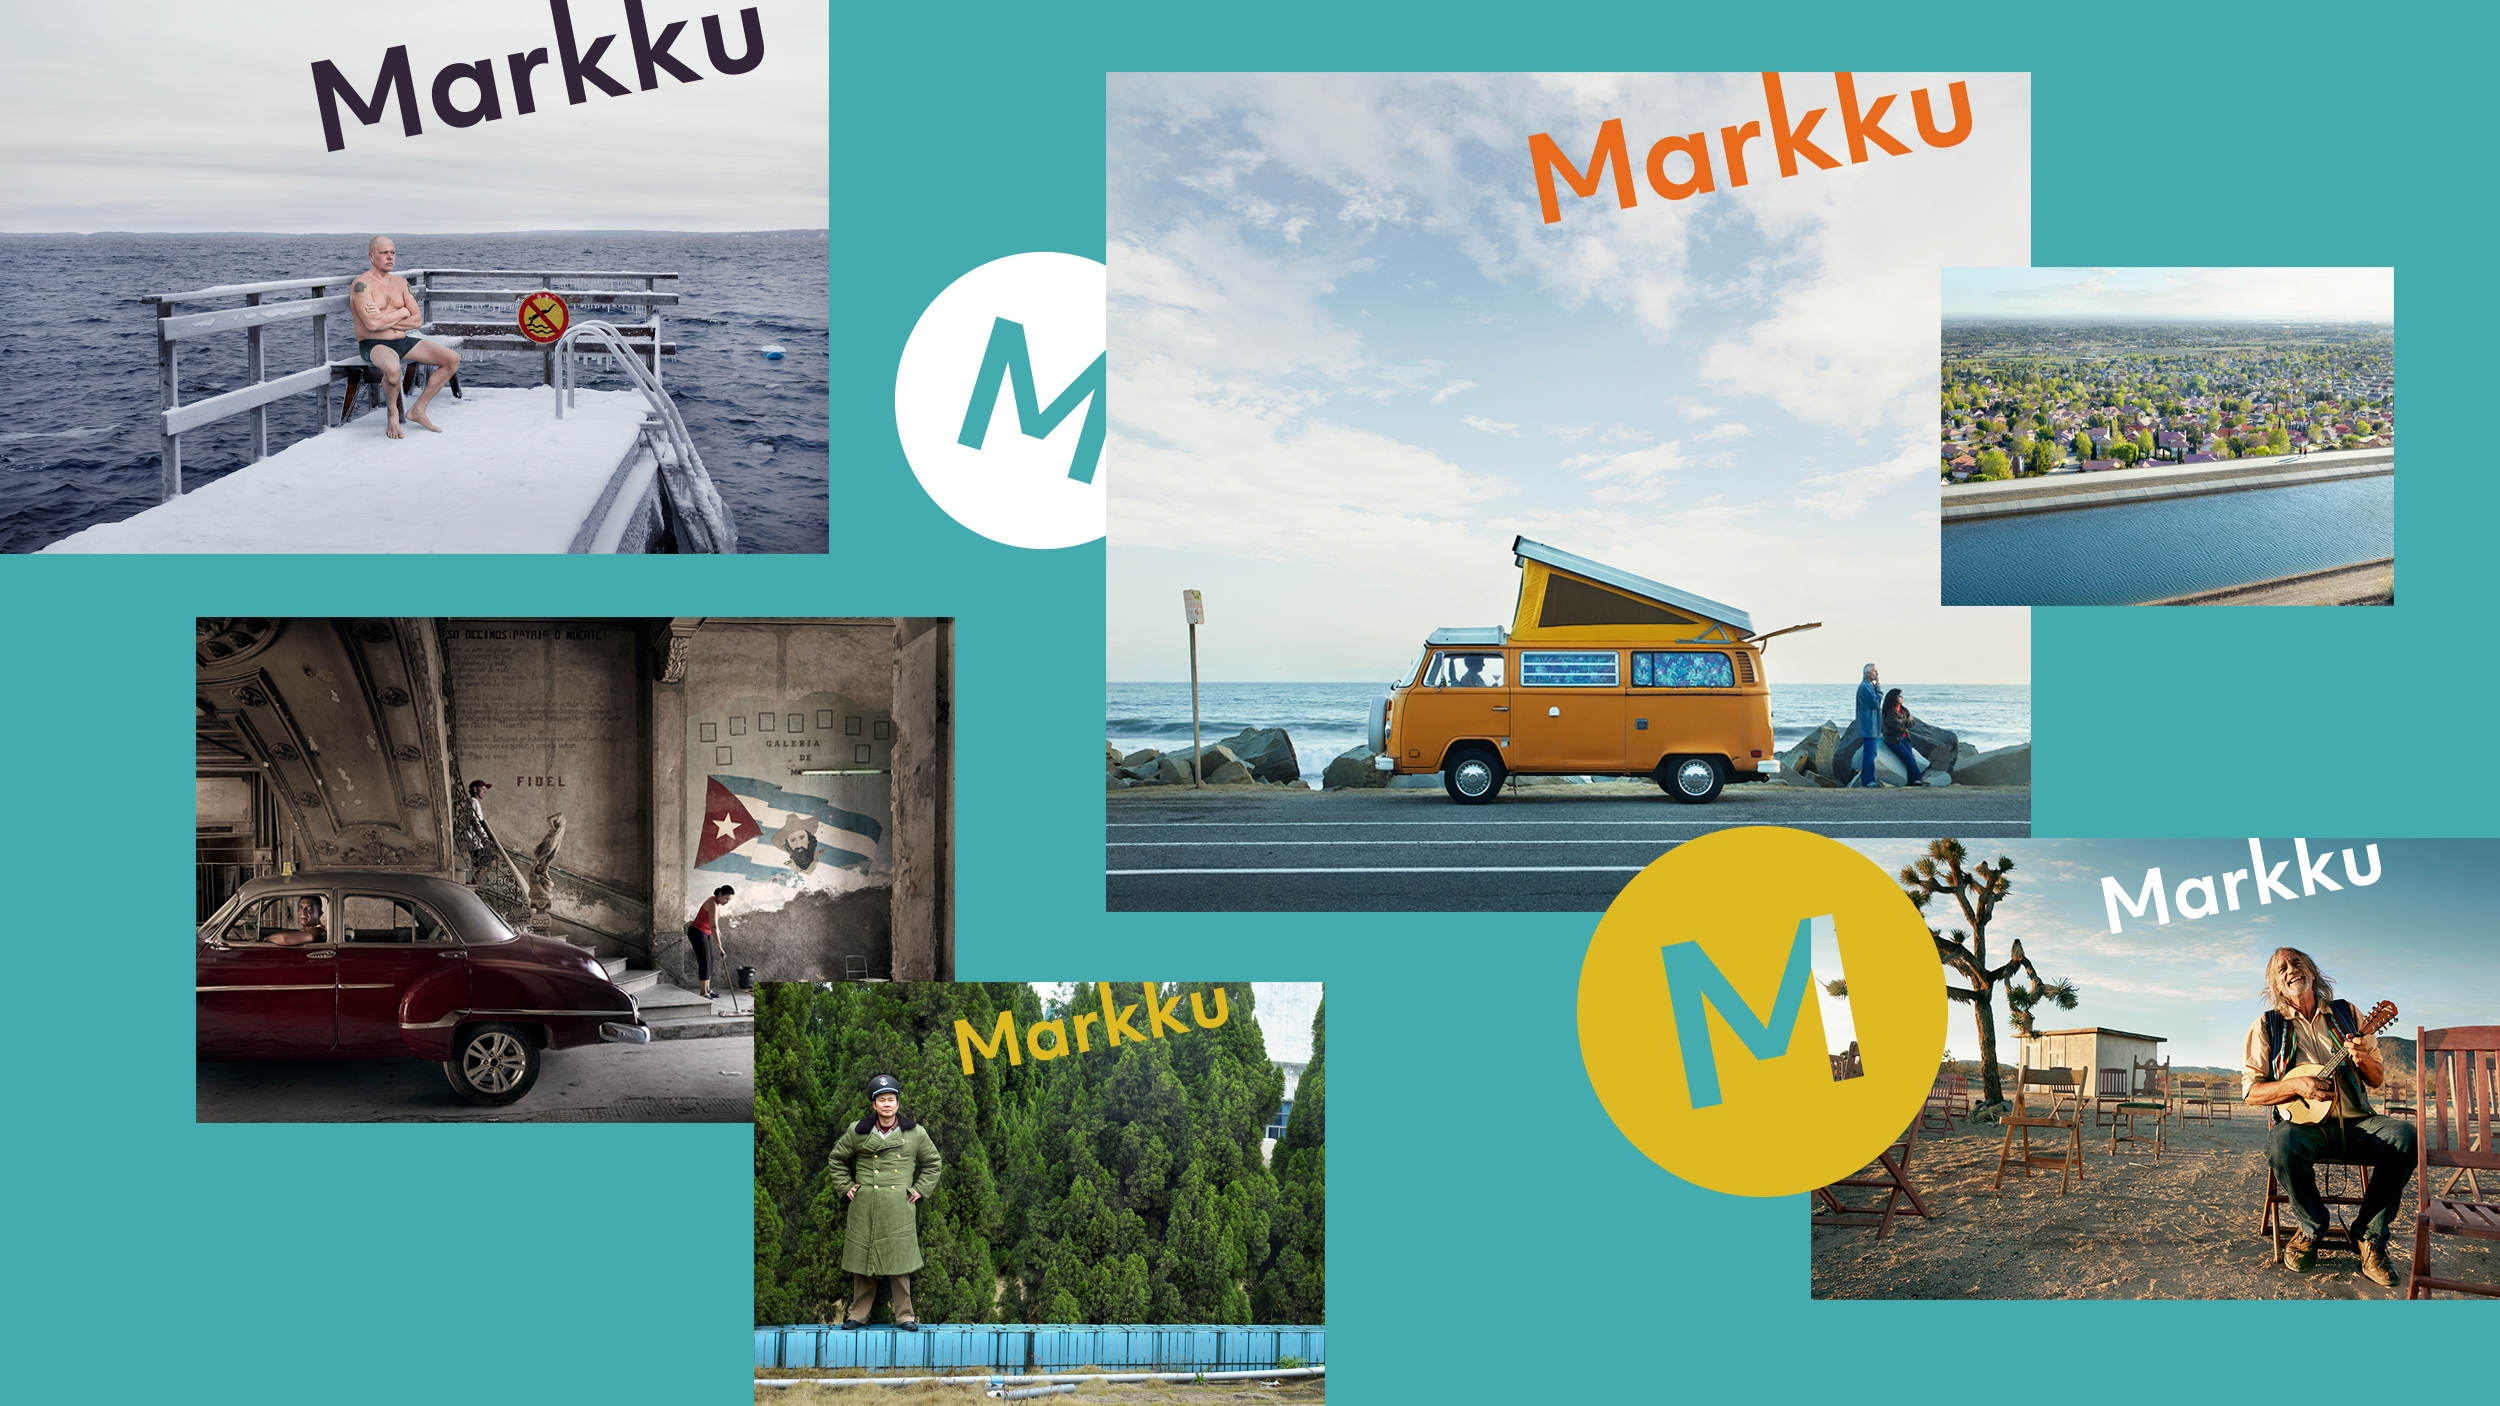 Tomi Lahdesmaki - Markku Photo Image 3